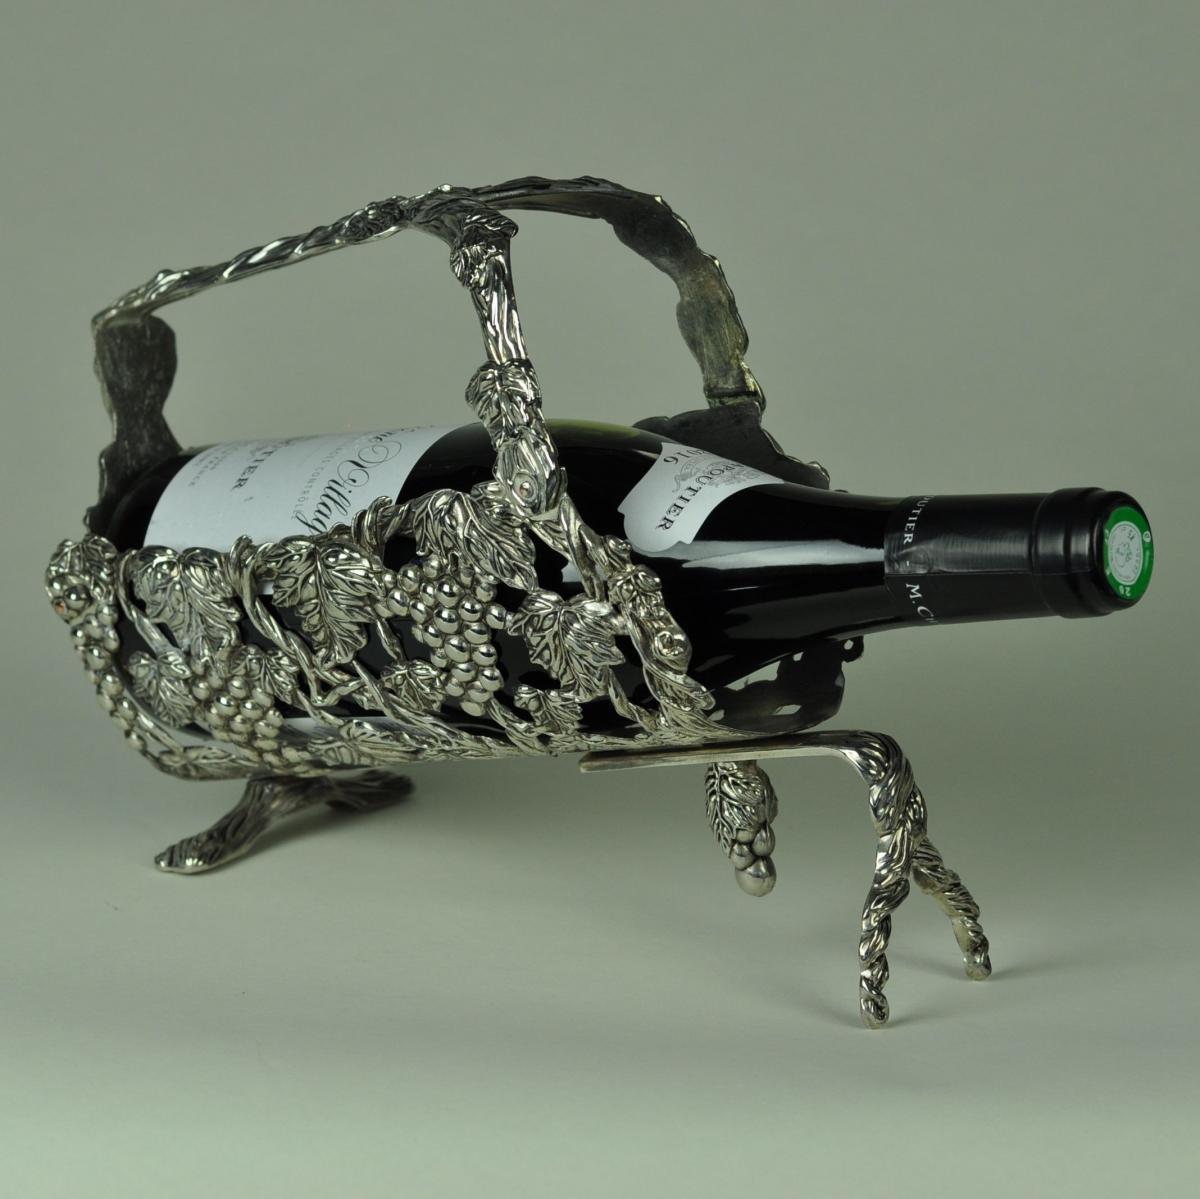 Silver plated wine bottle holder